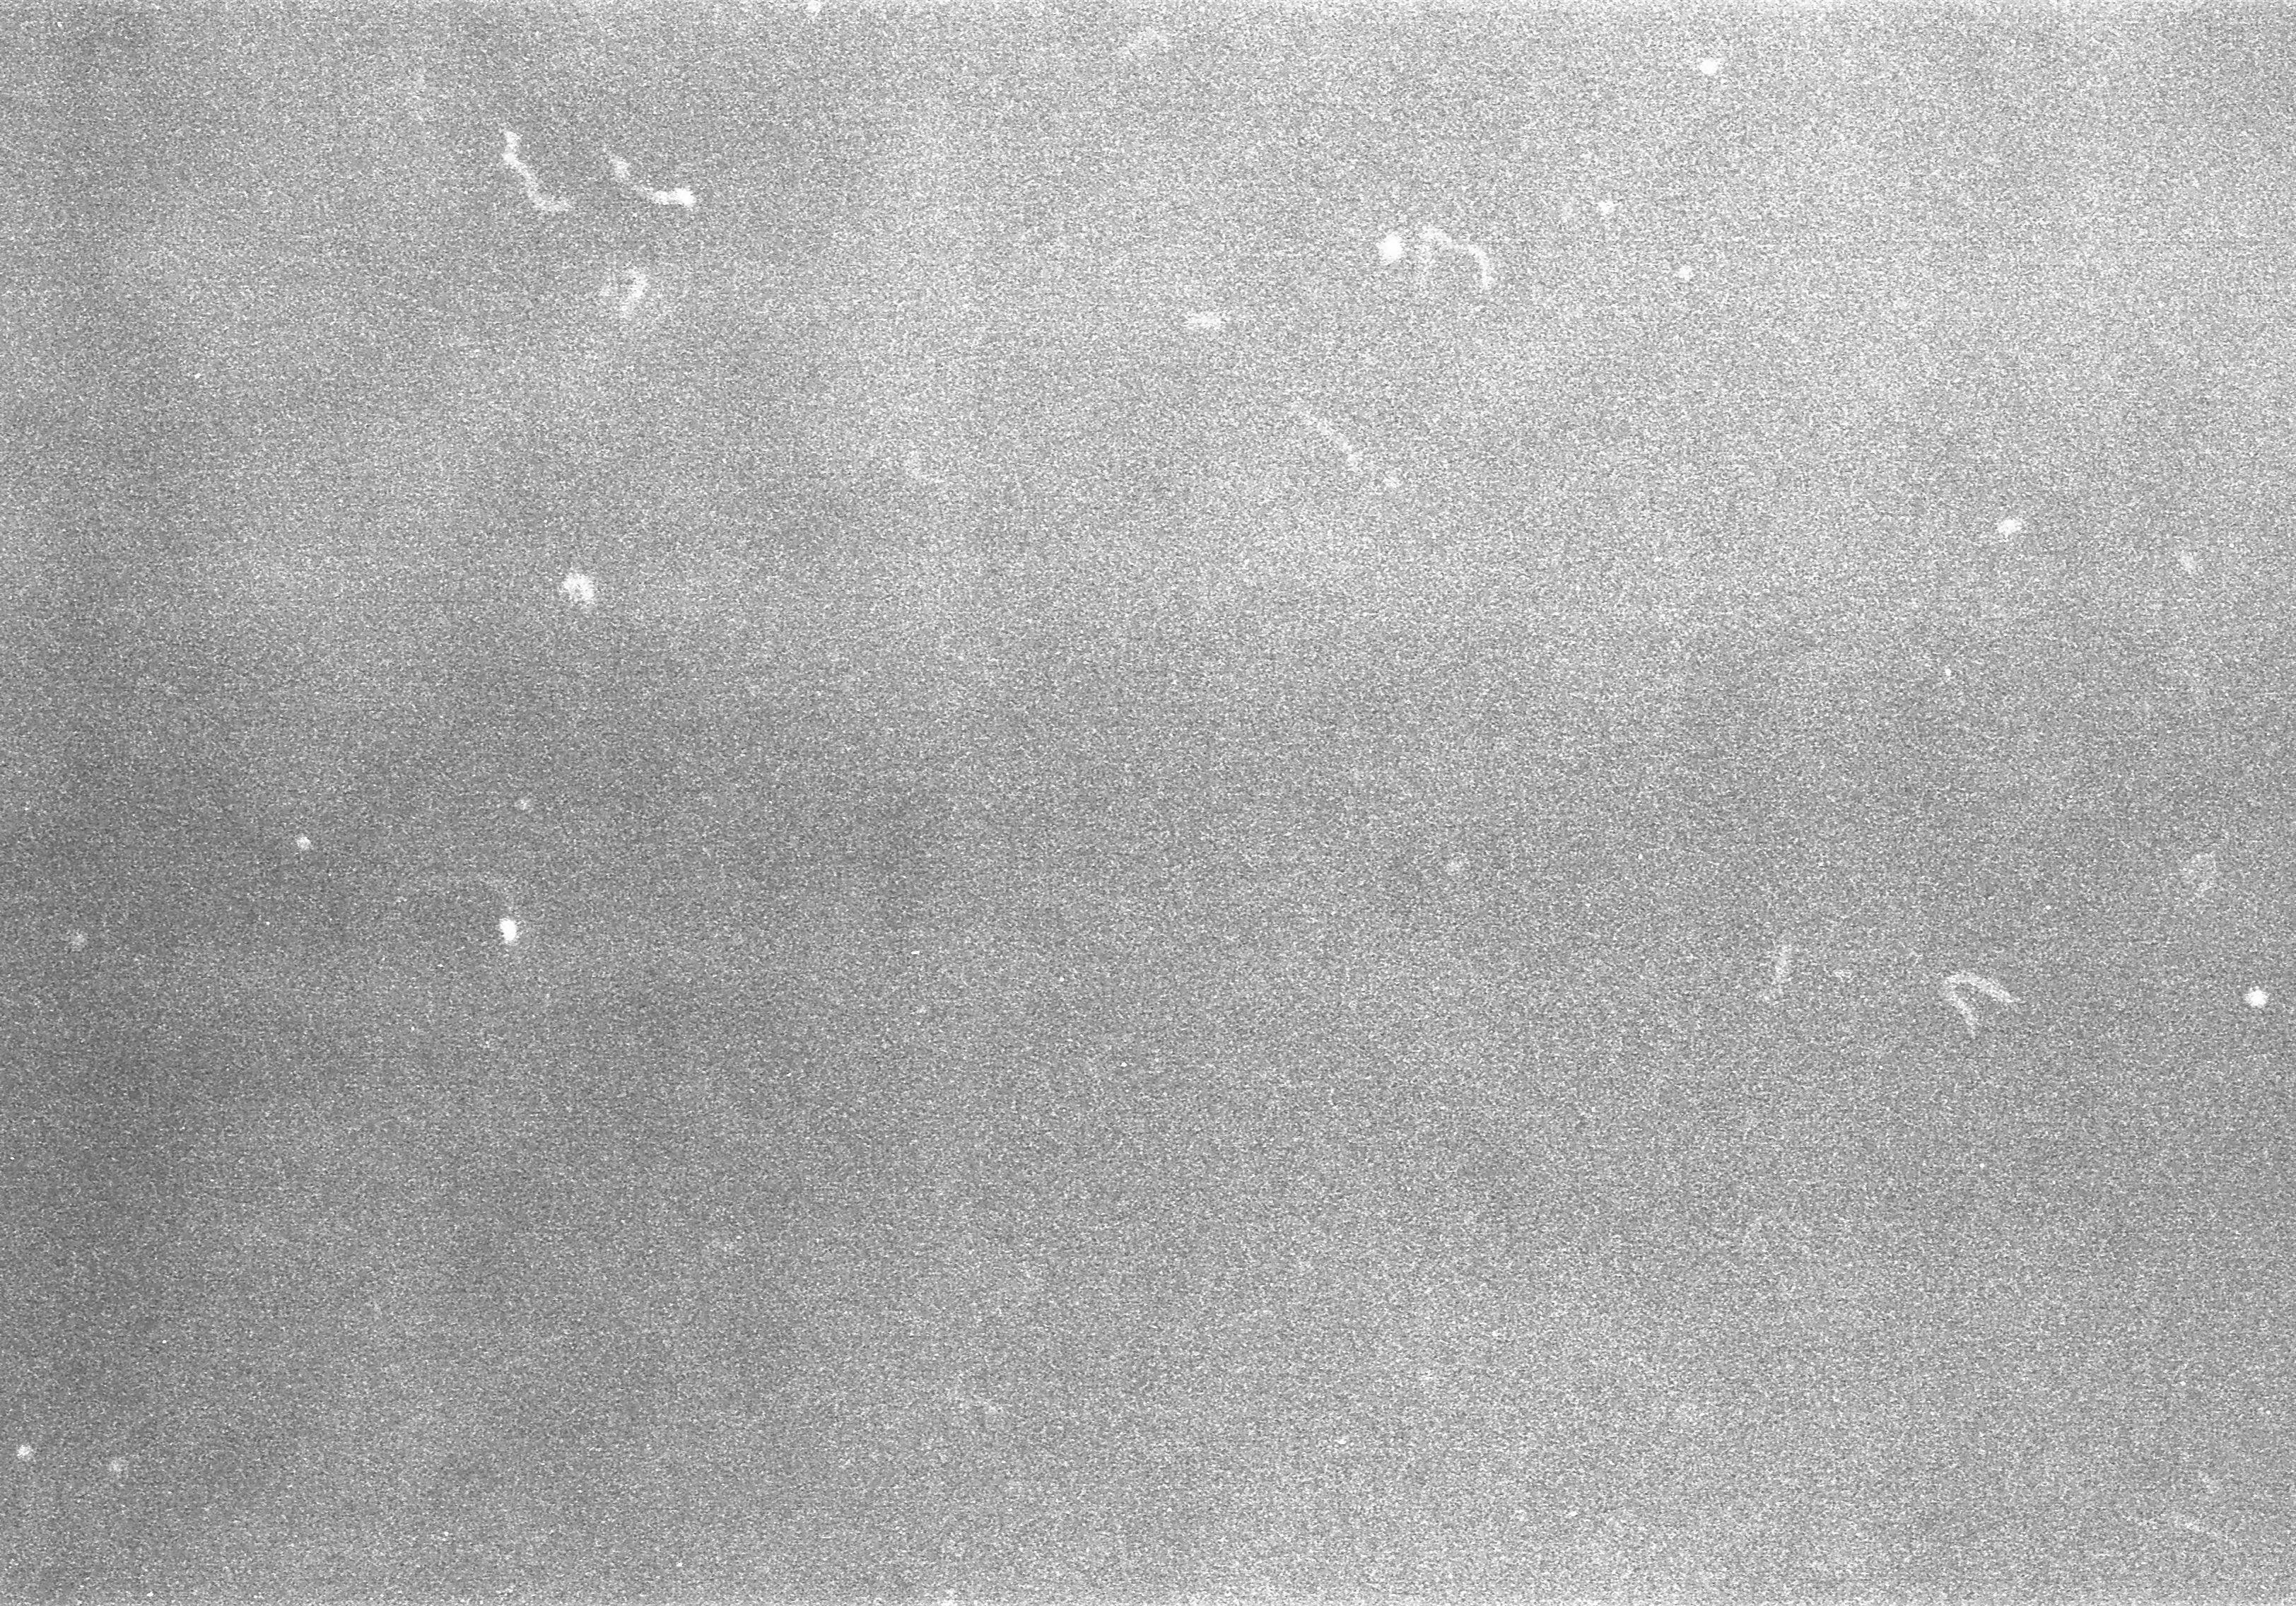 Pattern Wallpaper Hd Free Stock Photo Of 35mm Film Grain